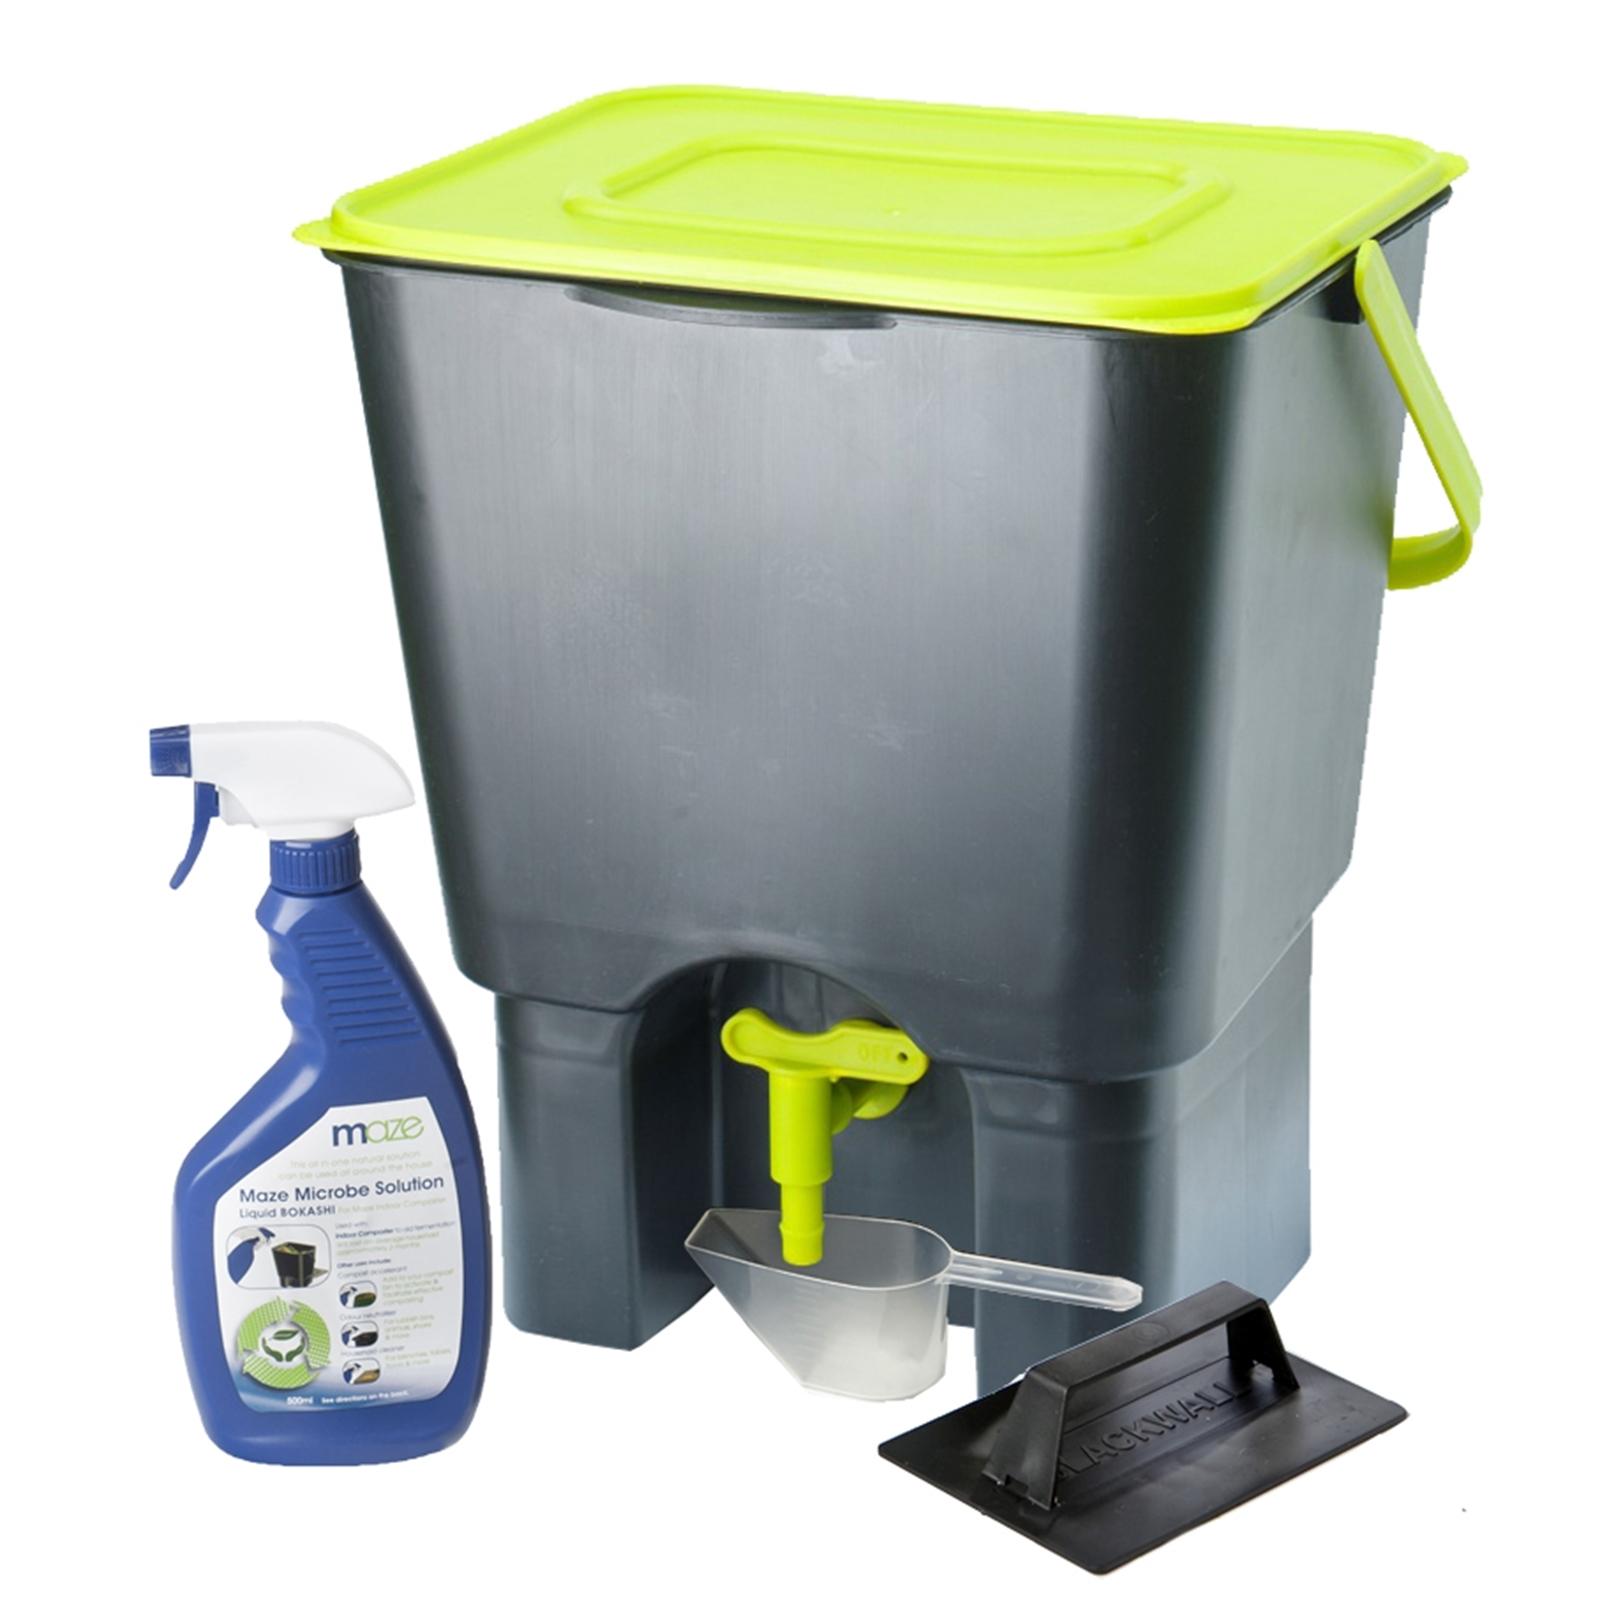 Maze 18L Bokashi Indoor Compost Bin